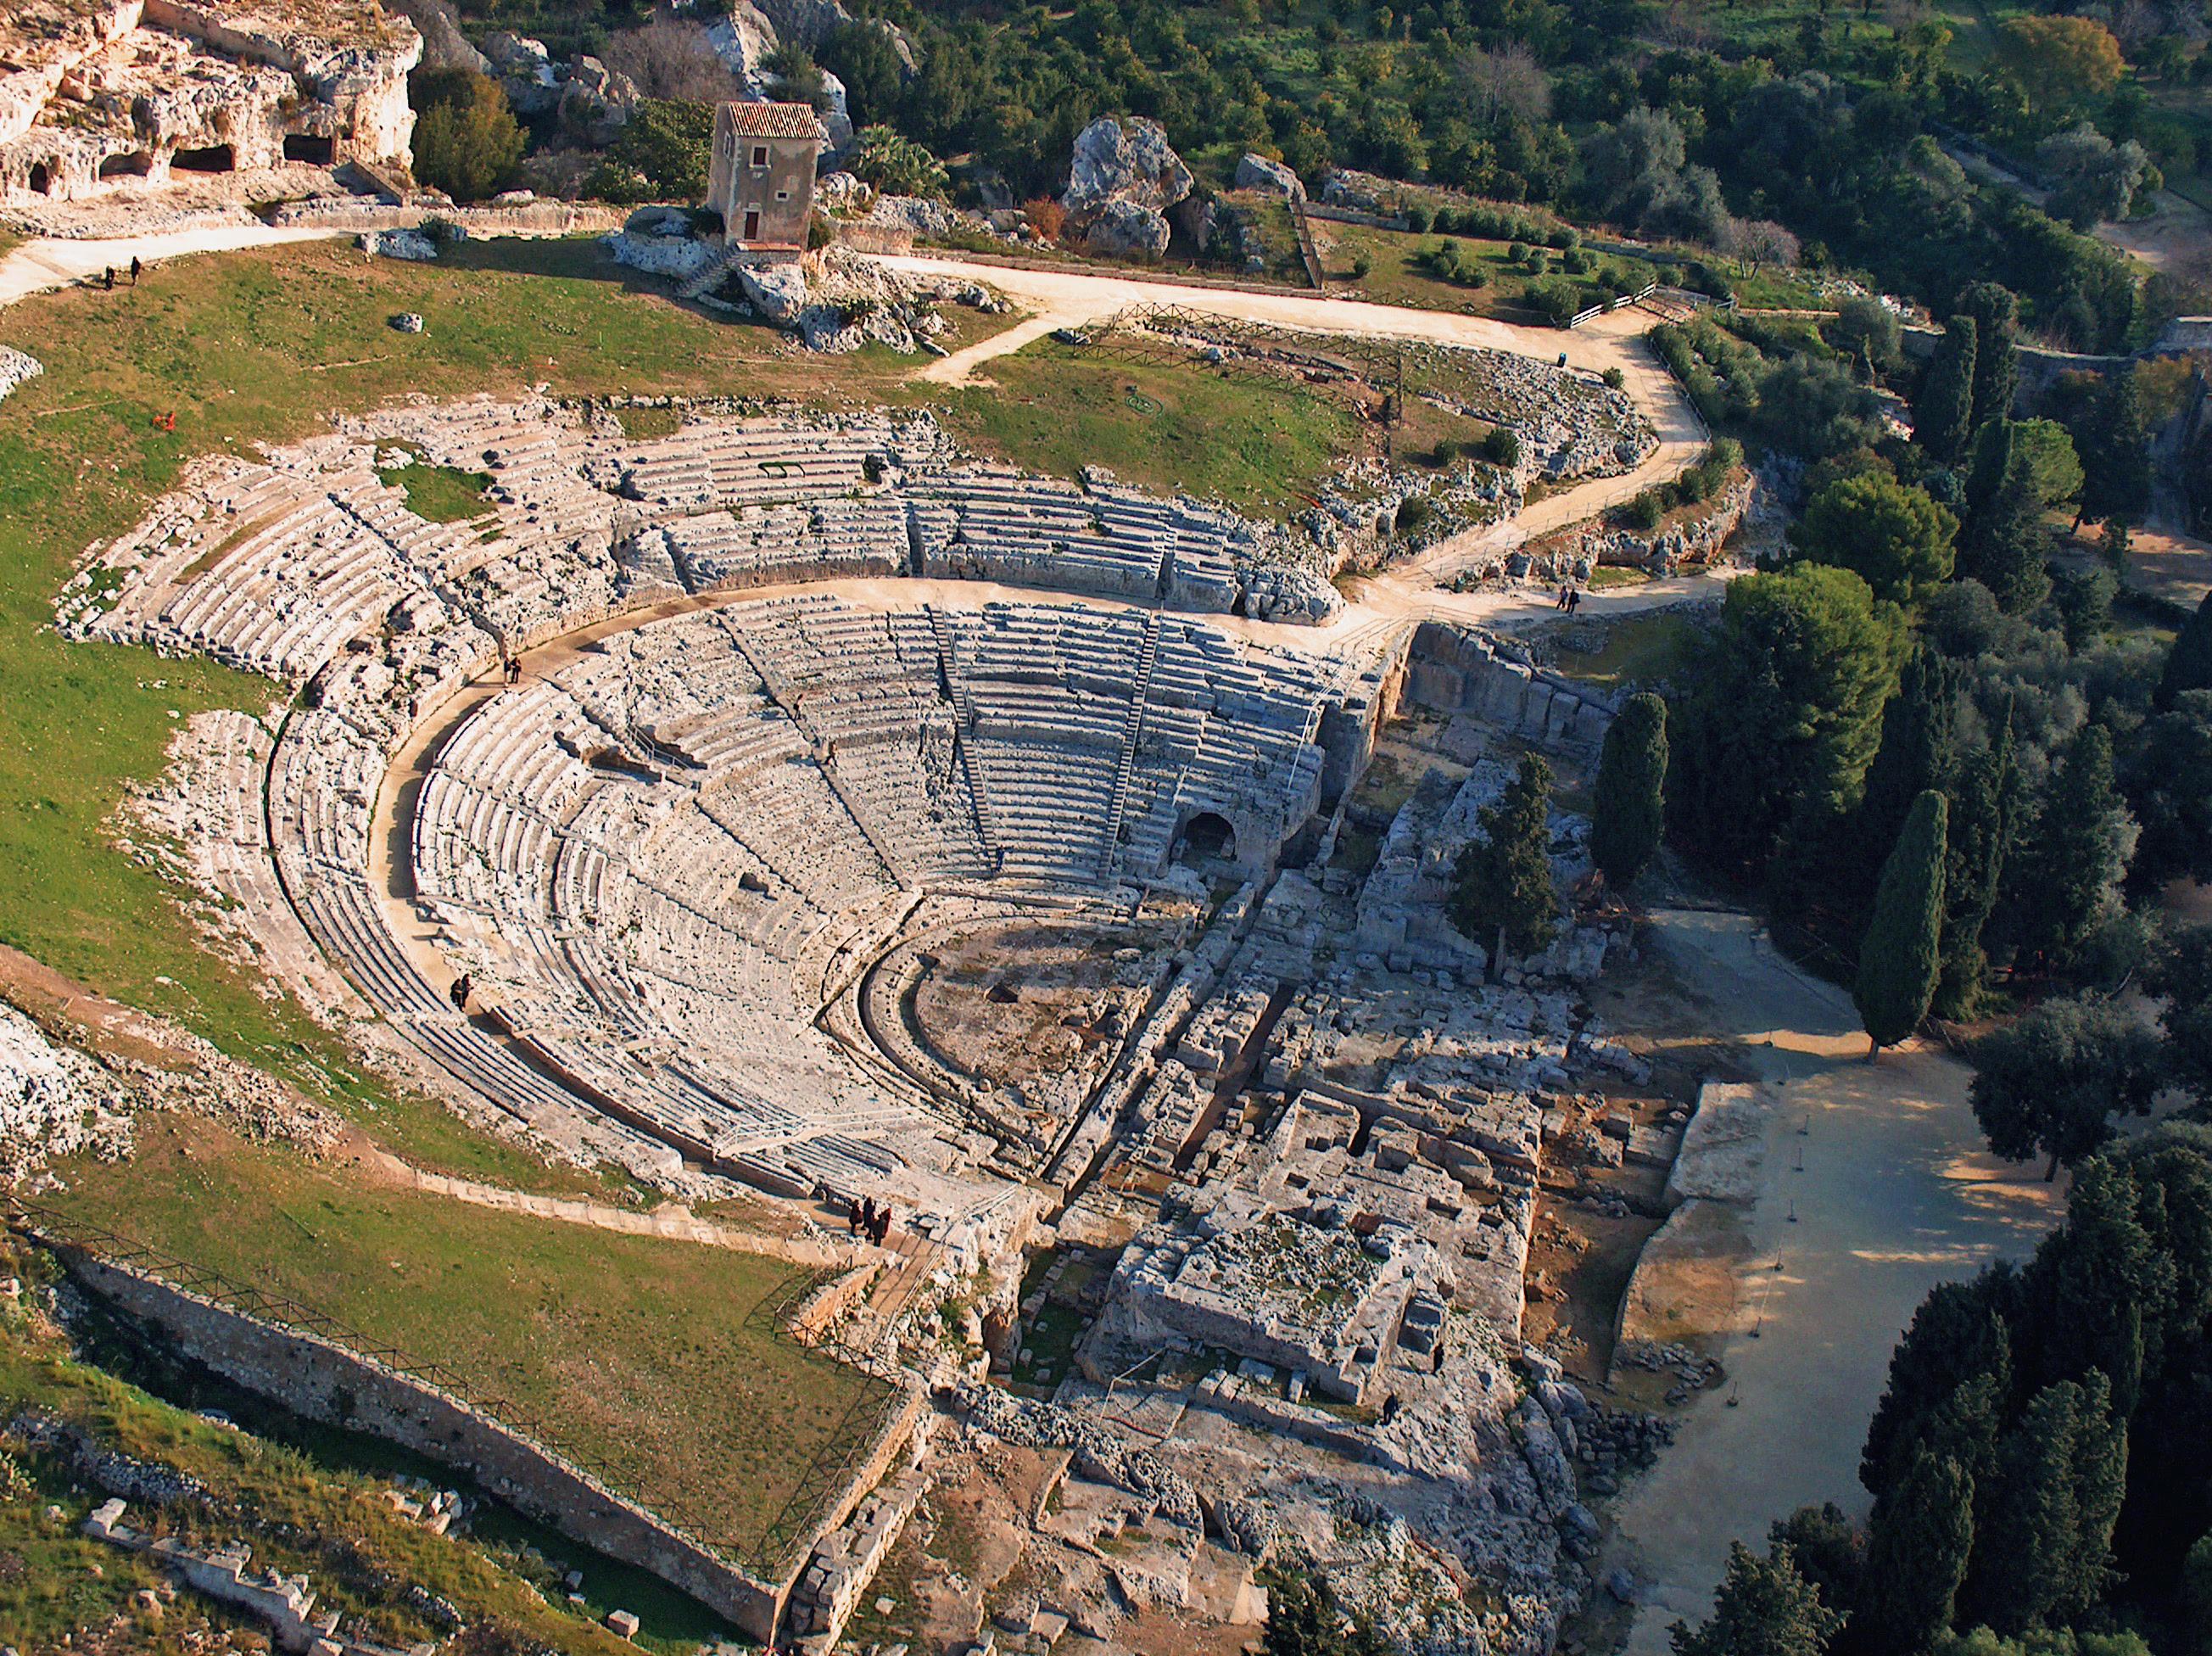 Teatro_greco_di_Siracusa_ _aerea